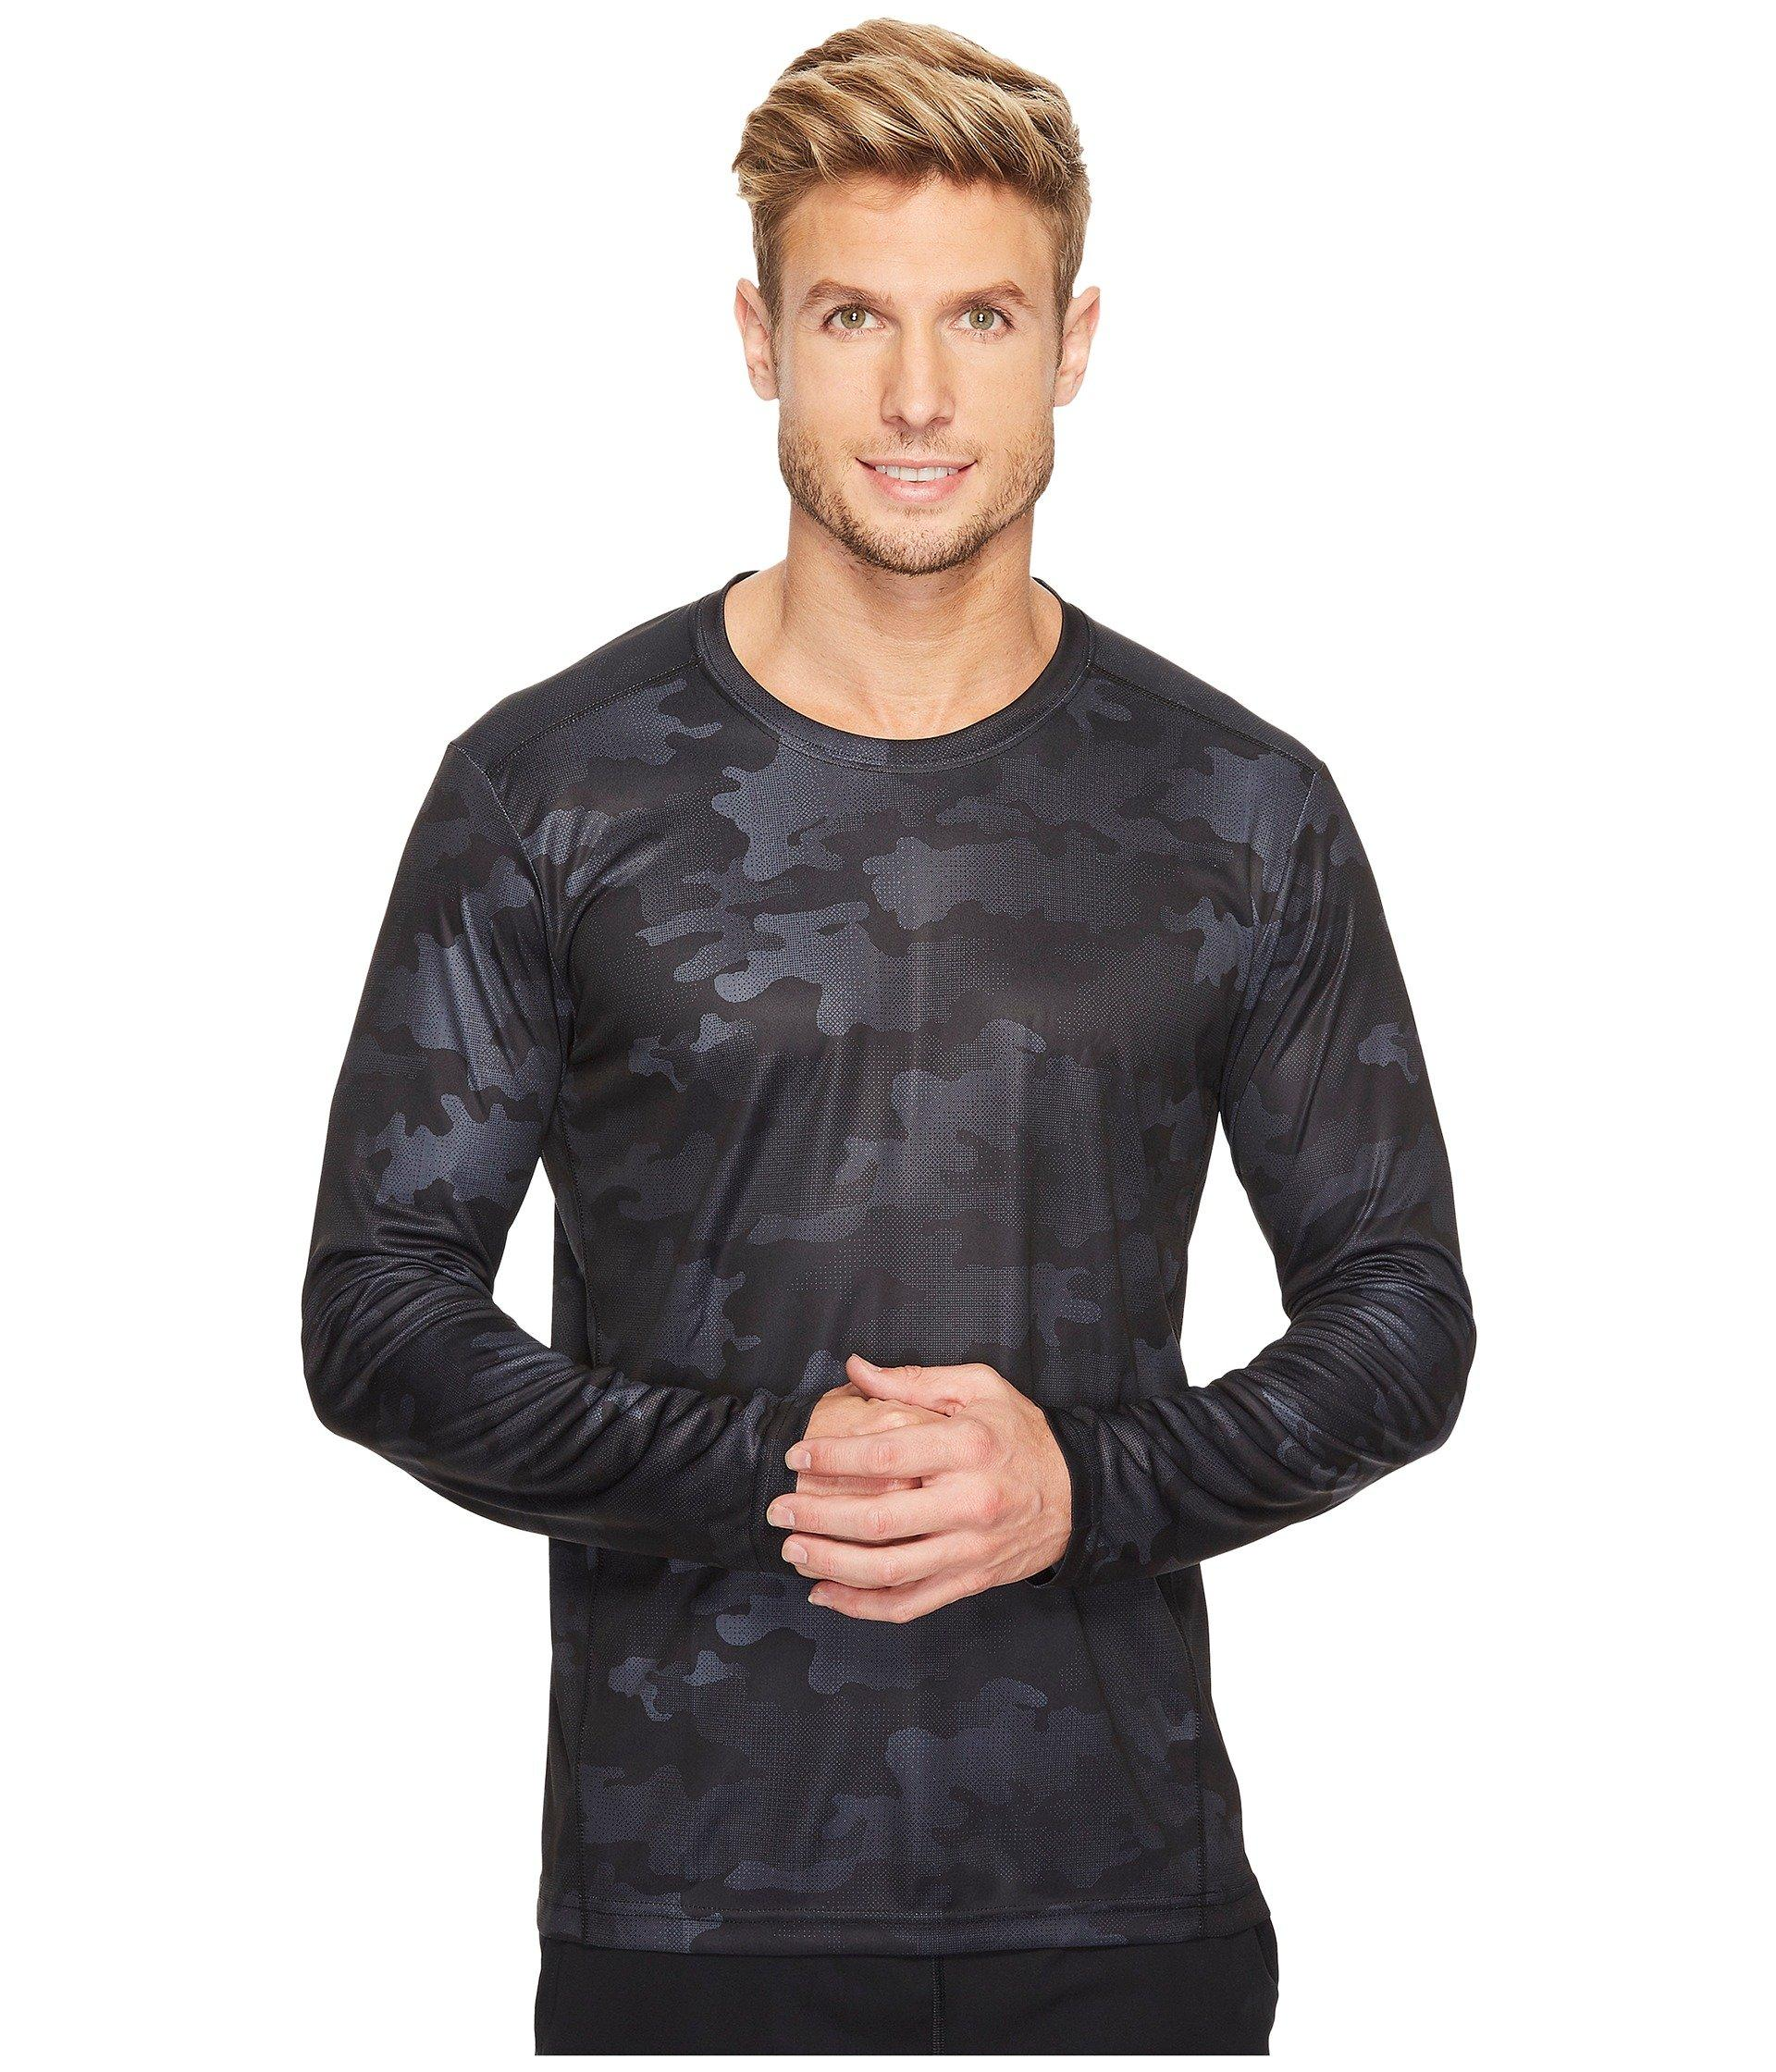 Adidas Originals Climalite® Graphic Single Long Sleeve Crew In Black Data Camo